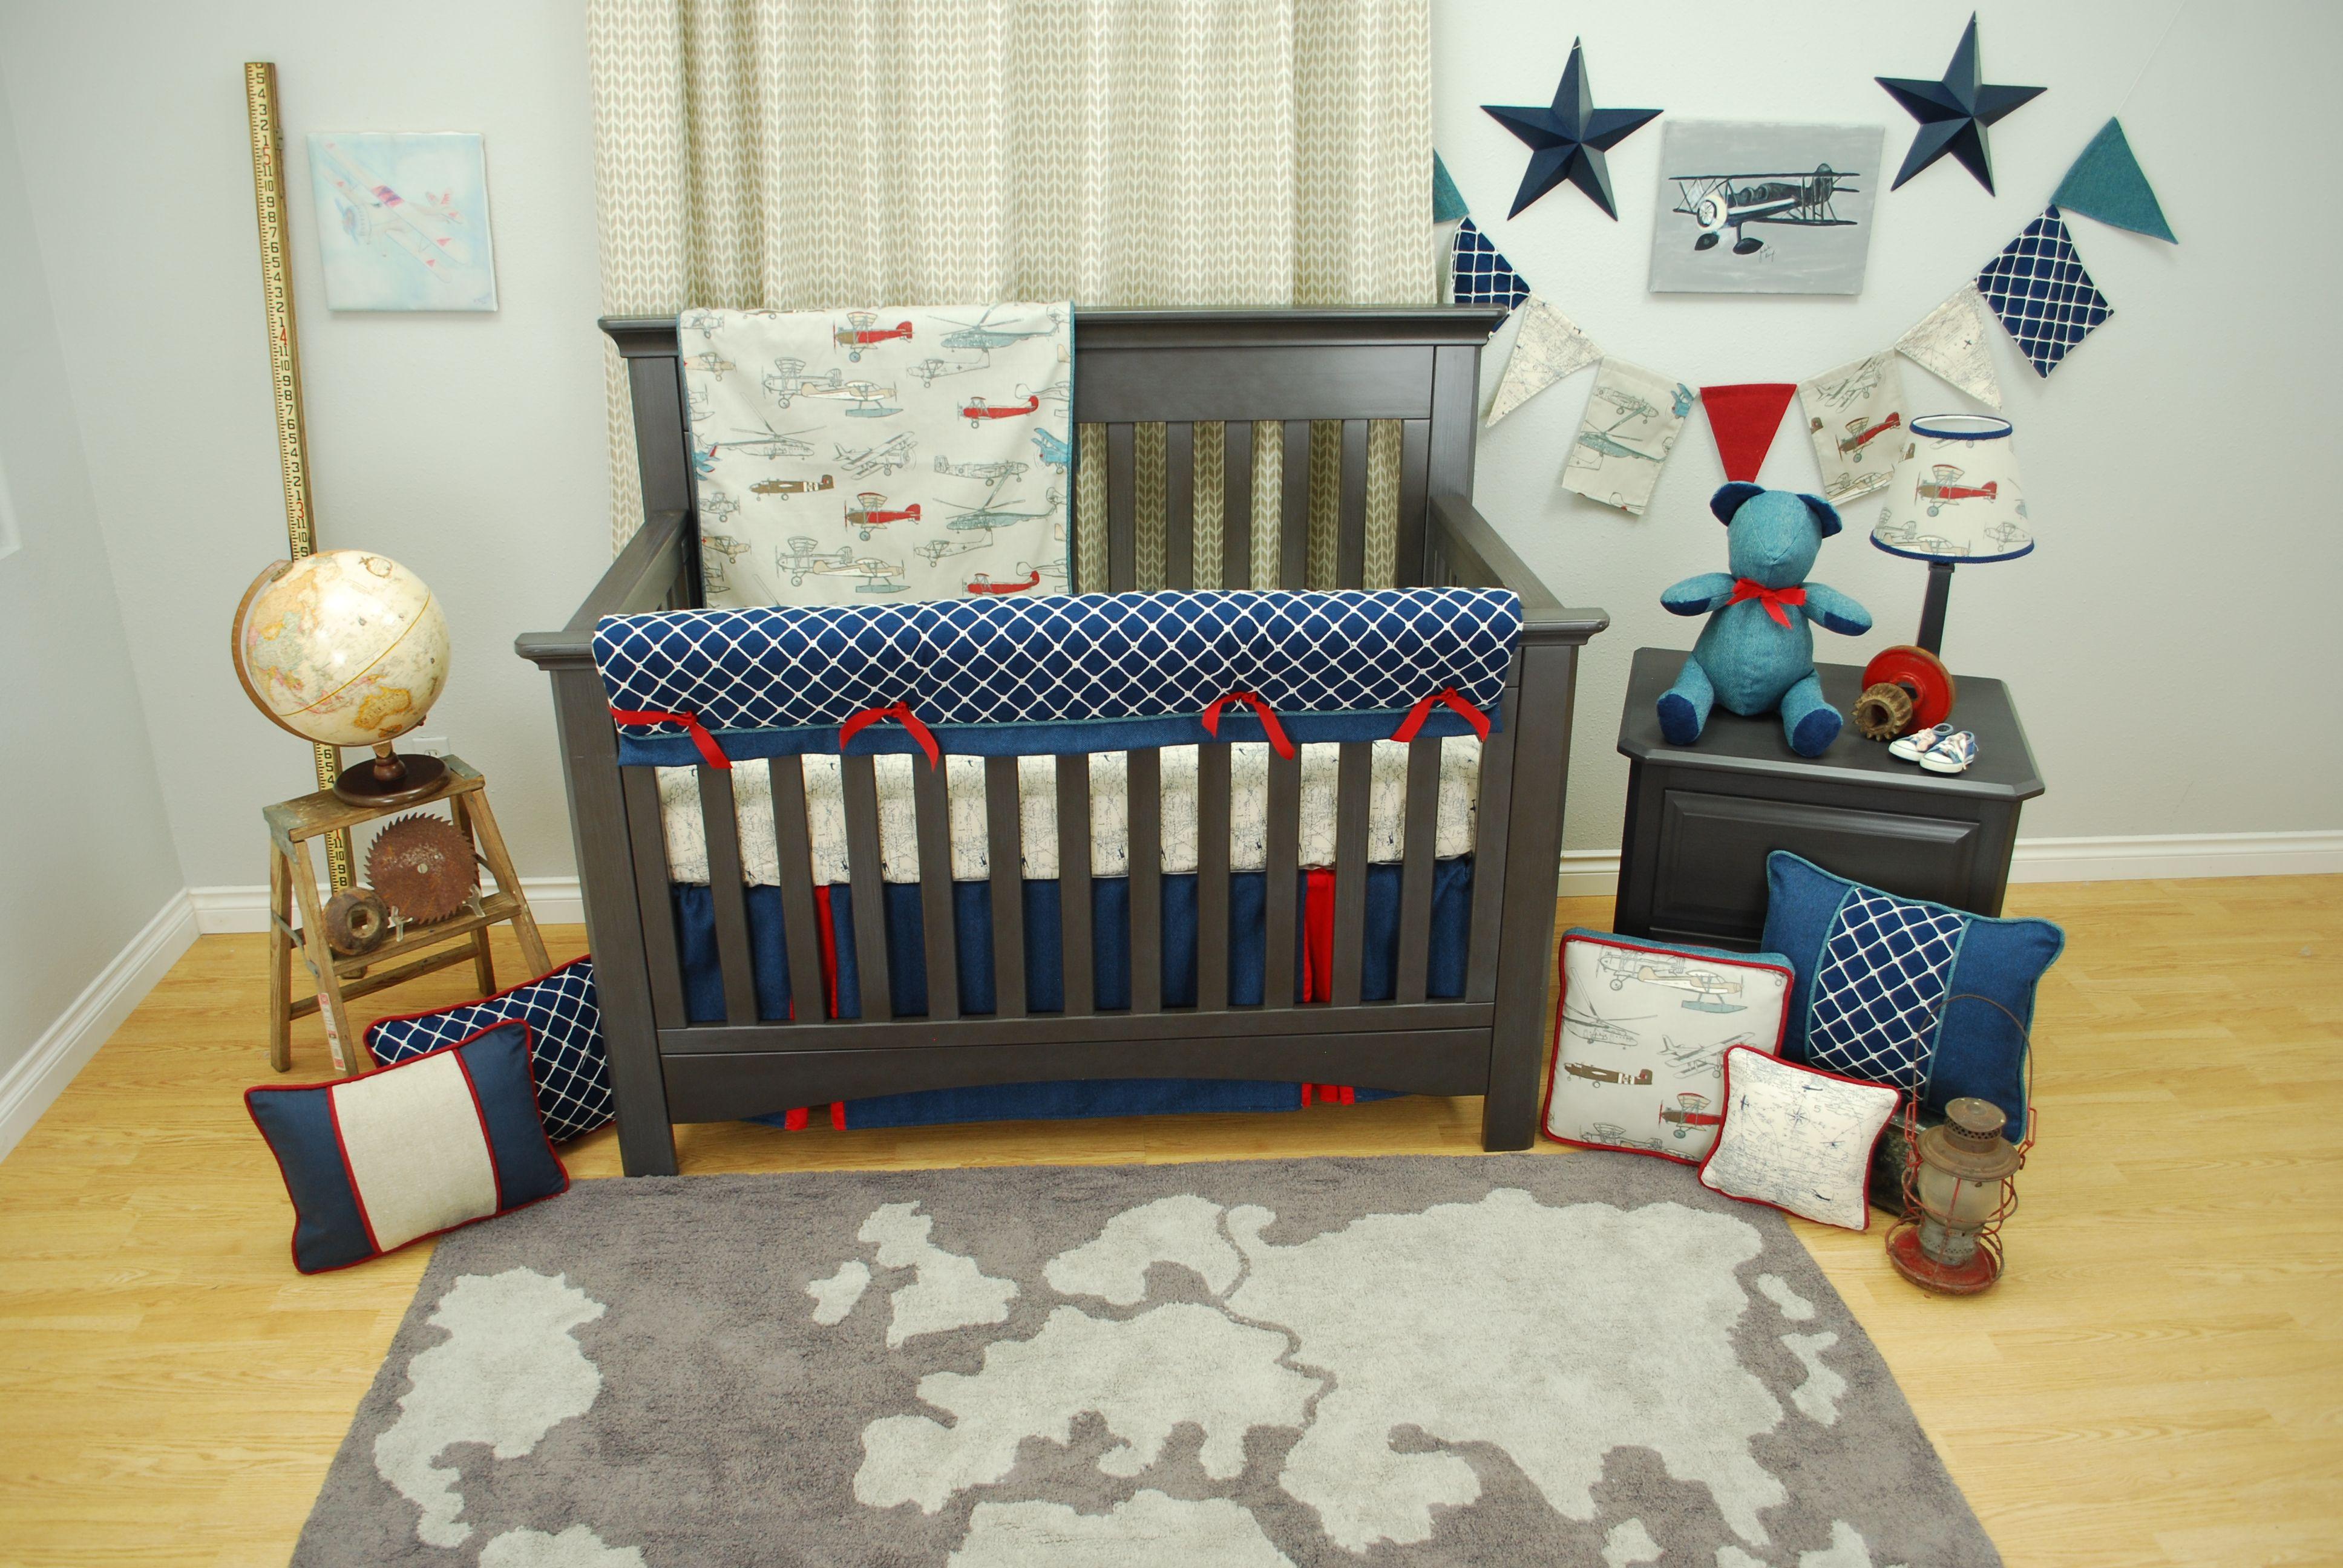 Navy And Red Vintage Airplane Crib Bedding Set In A Transportation Theme Nursery With Globe Art Pine Creek Judith Raye